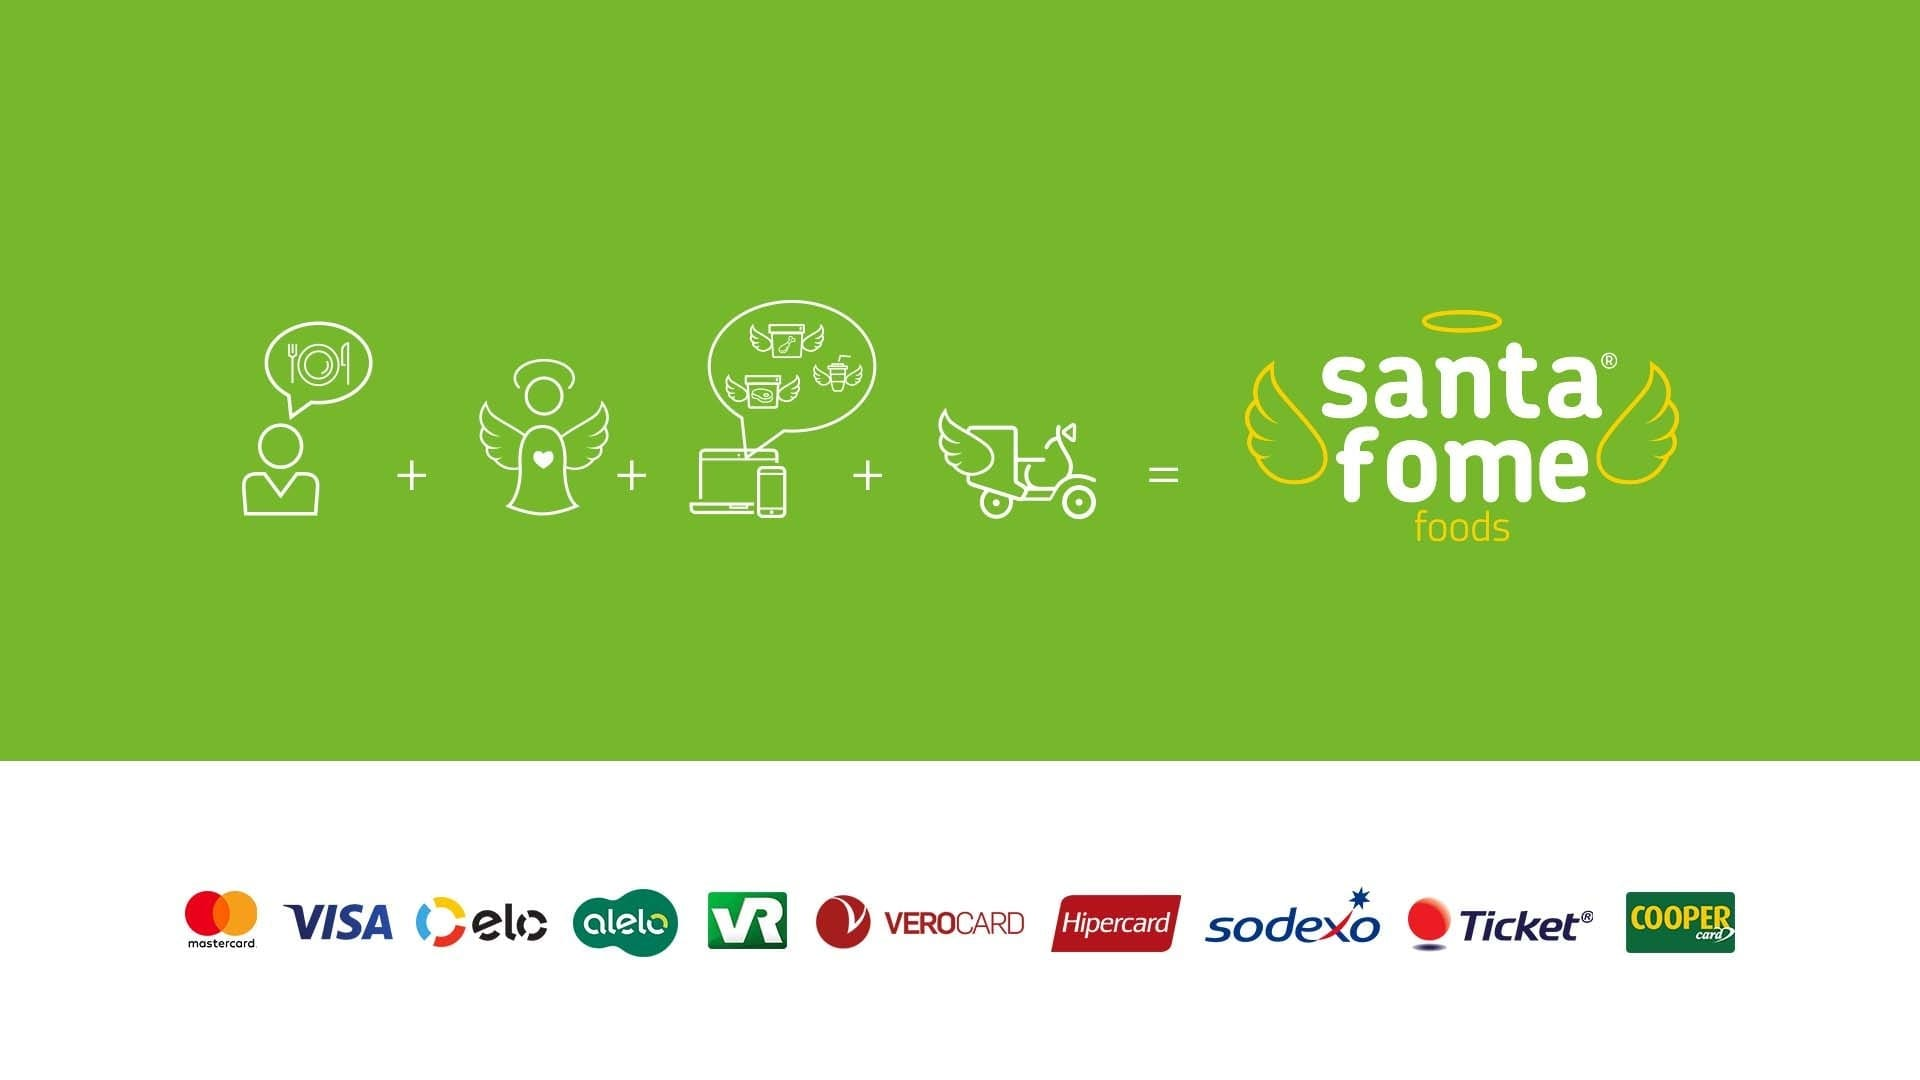 santa-foome-foods-delivery-de-comida-saudavel-em-maringa